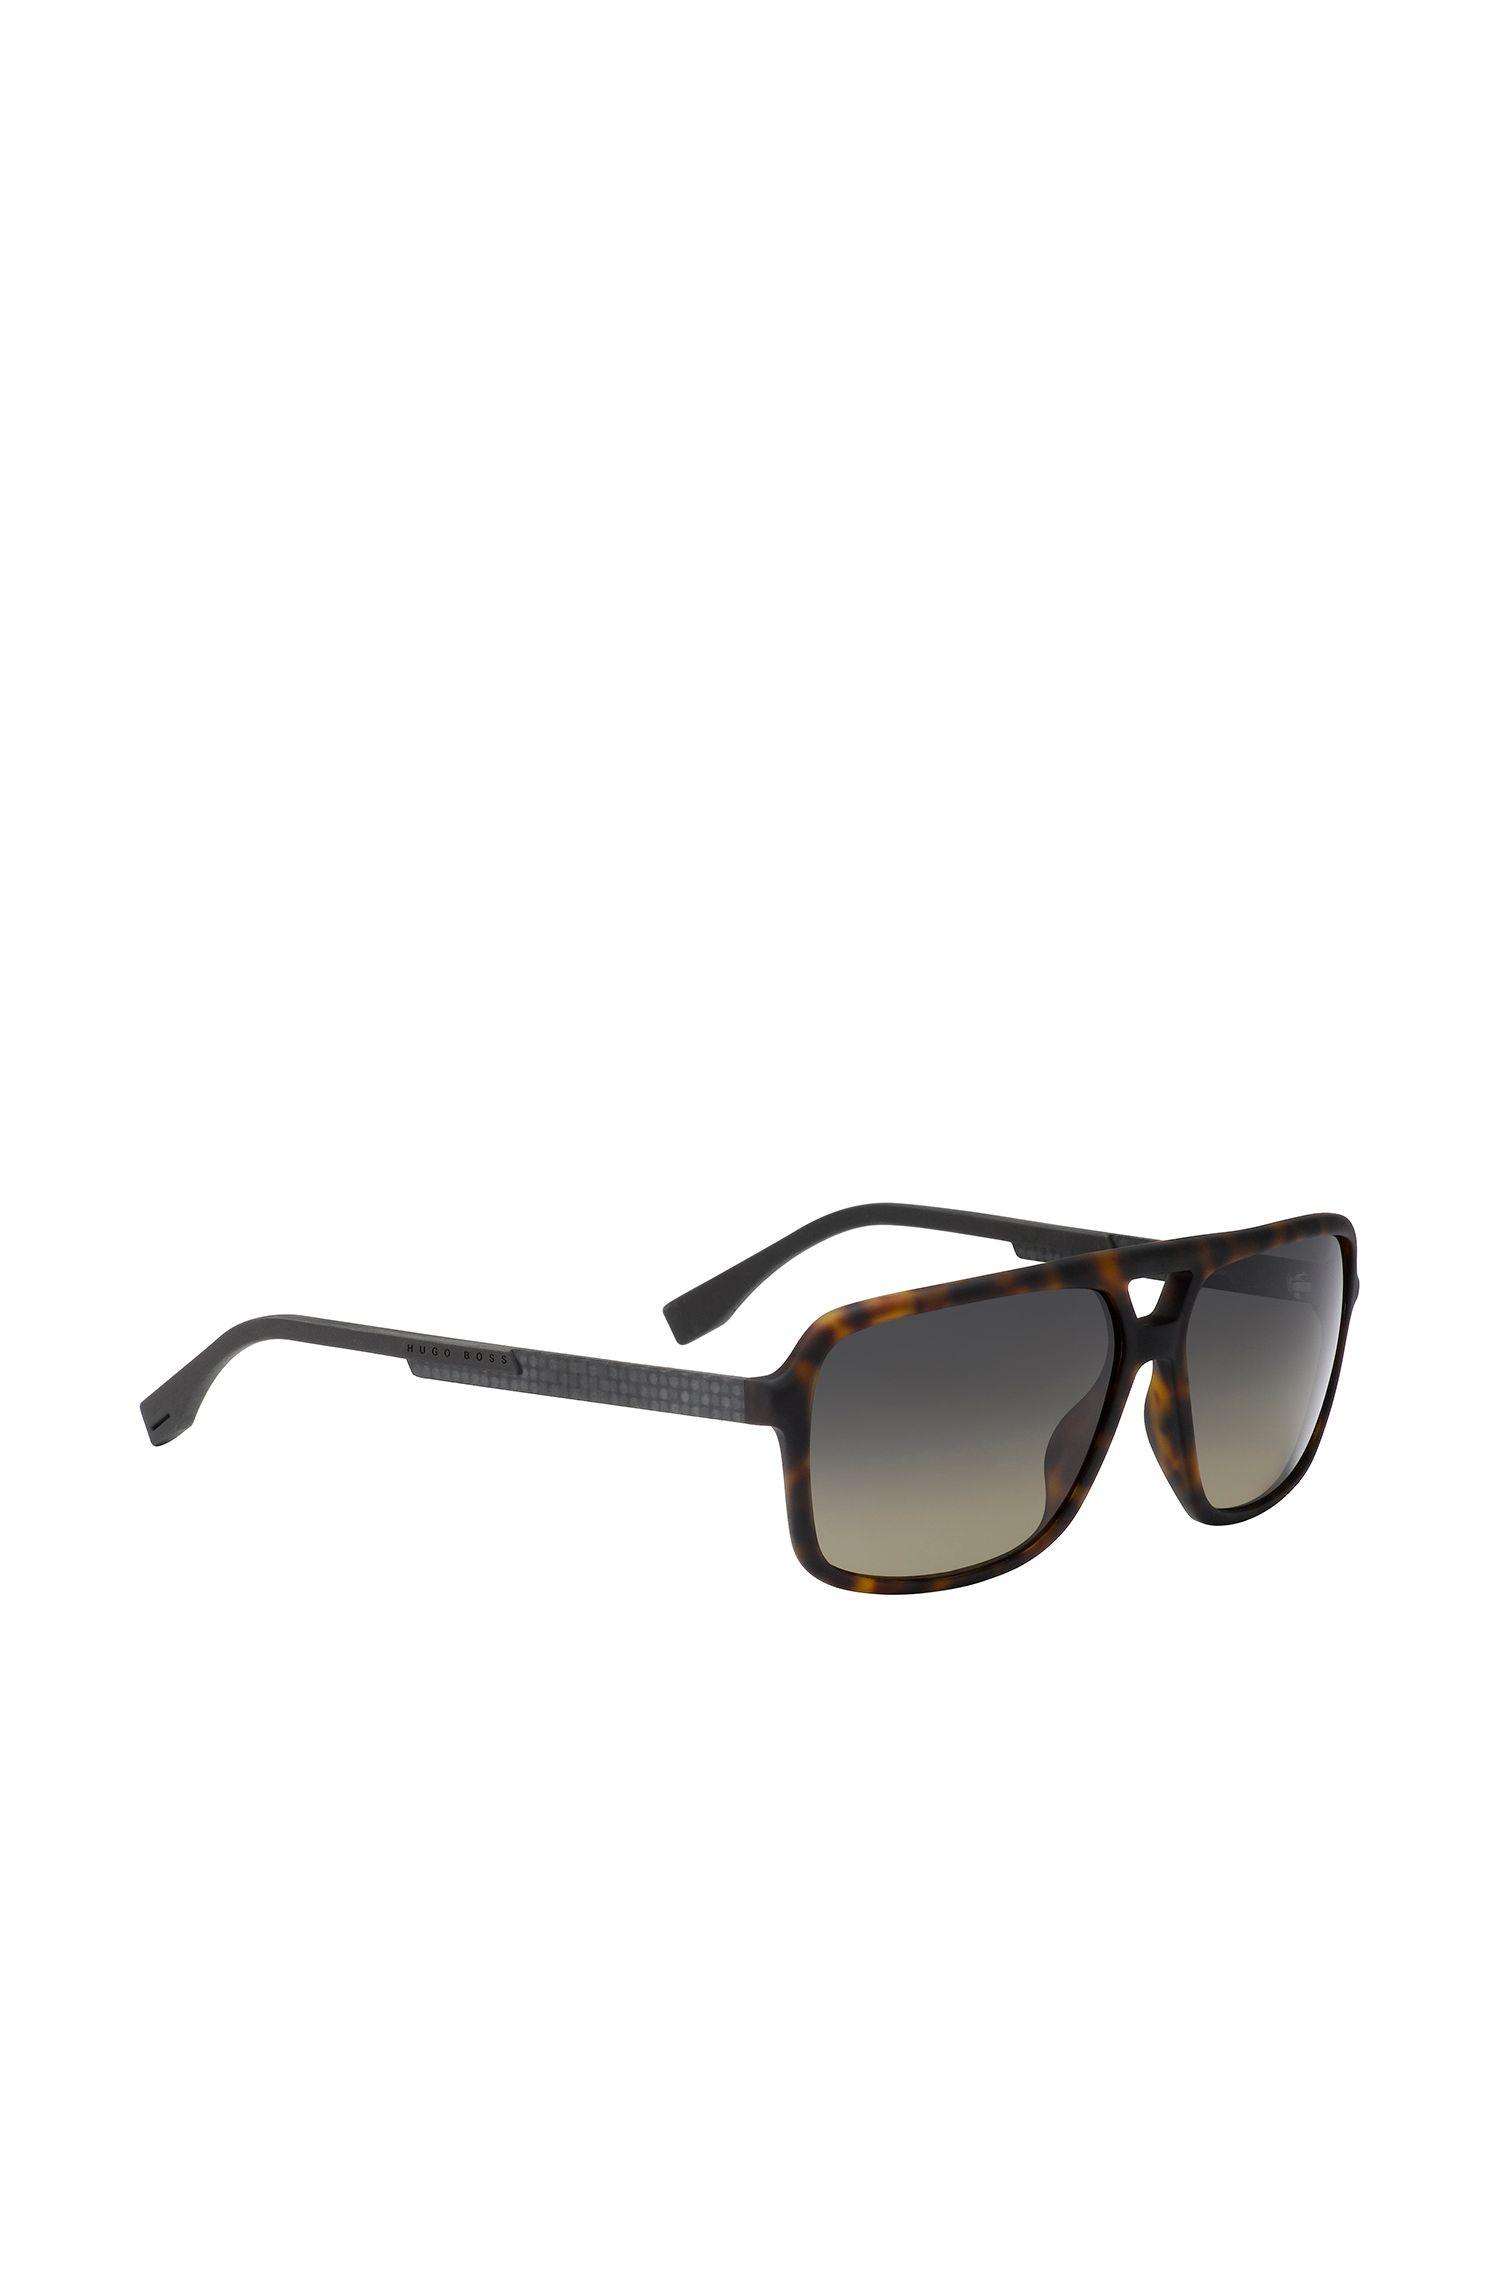 'BOSS 0772S' | Green Grey Lens Navigator Sunglasses